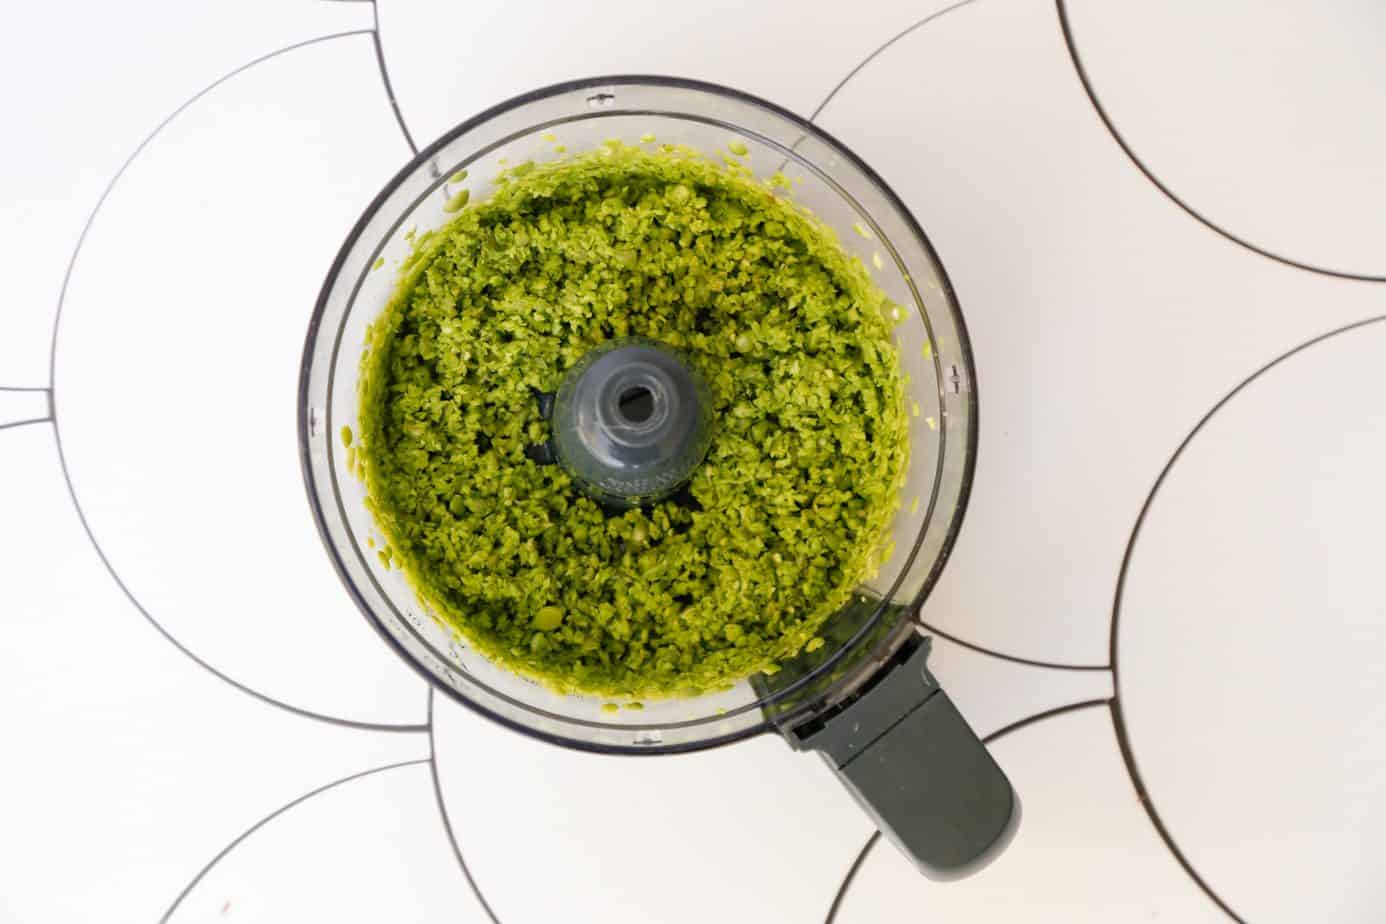 vegan pea pesto with mint crostini from above